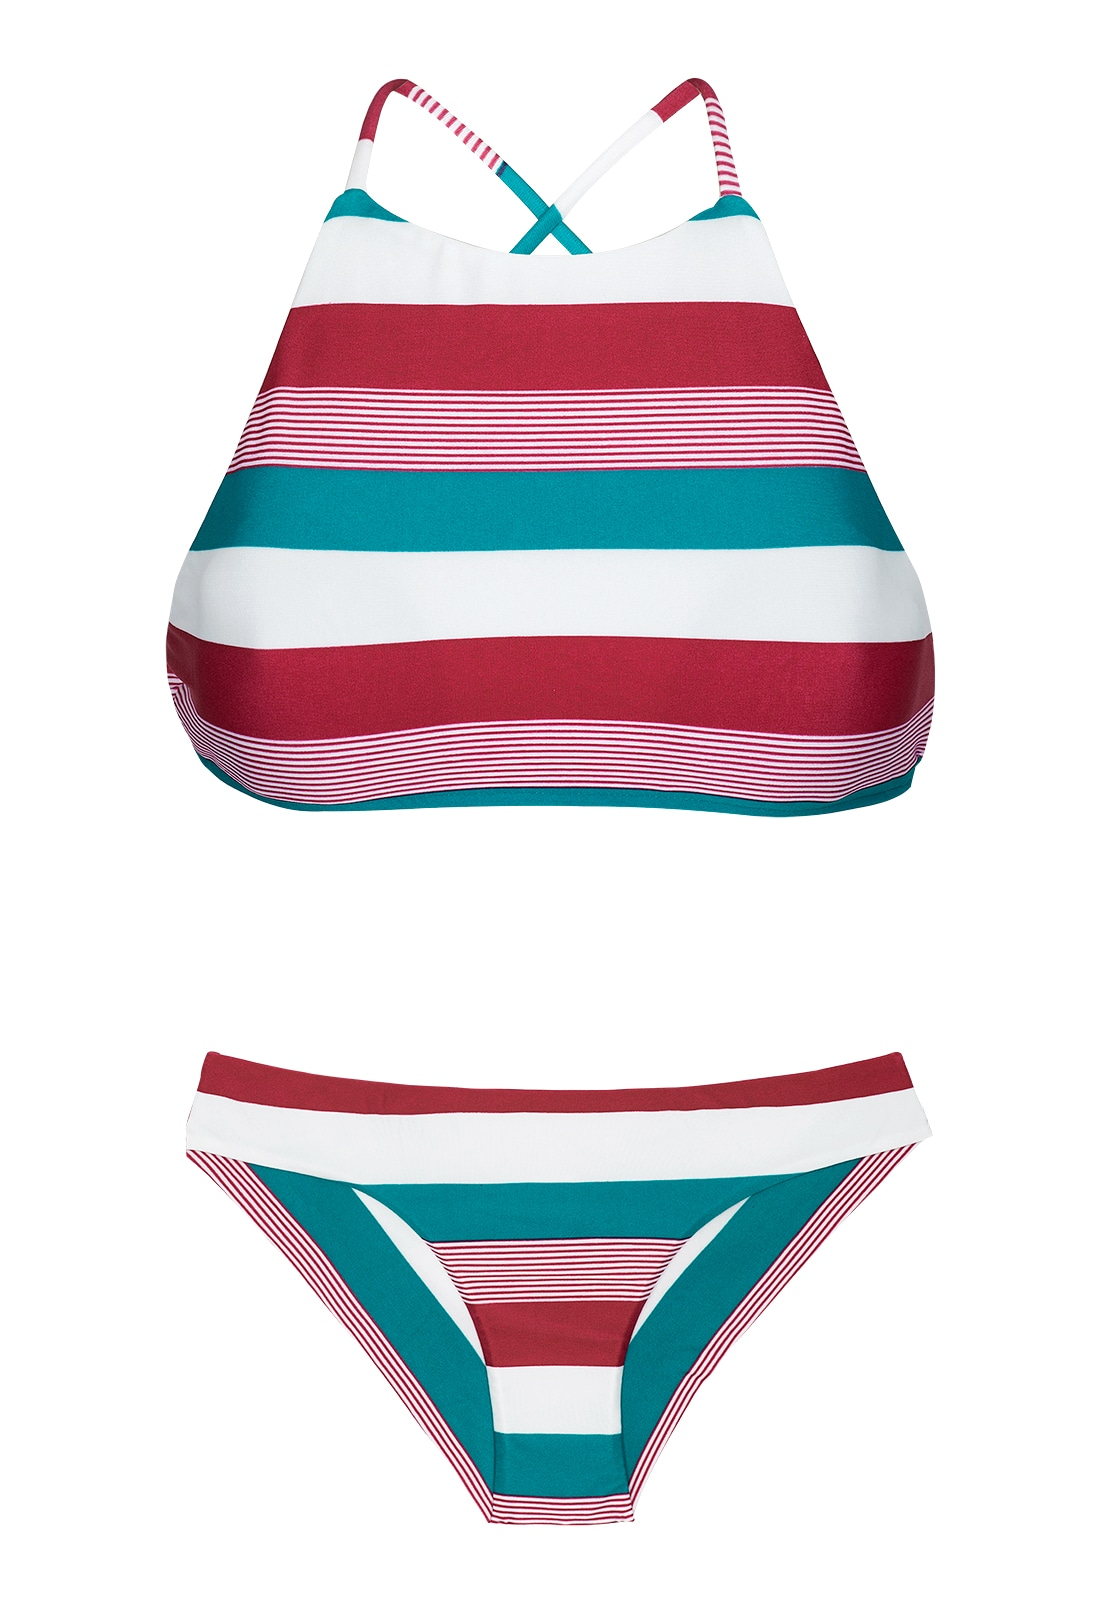 8d1ff304f32 Bikini Gecropte Bikini In Driekleurige Strepen - Buzios Sporty